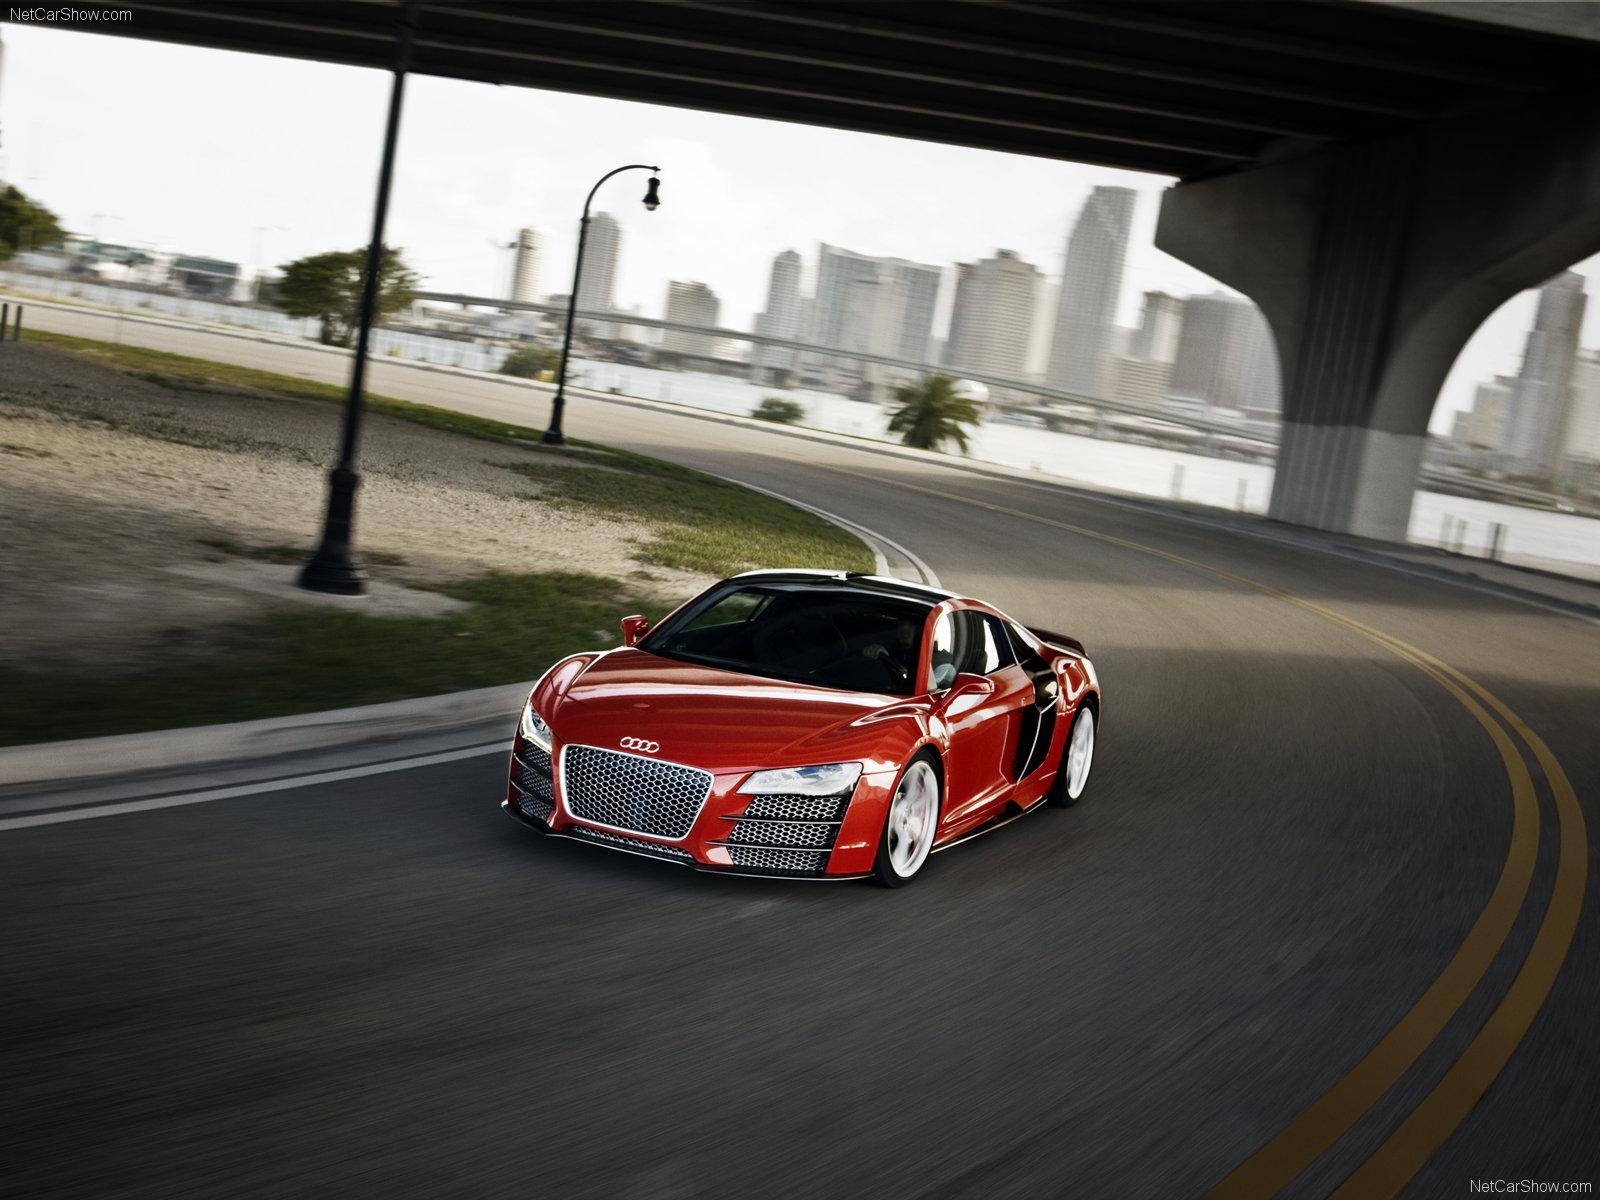 http://2.bp.blogspot.com/-aM11-bMHw24/TqfX-N0zgFI/AAAAAAAAAi4/su6rGvVV72U/s1600/Audi-R8_TDI_Le_Mans_Concept_2008_1600x1200_wallpaper_04.jpg